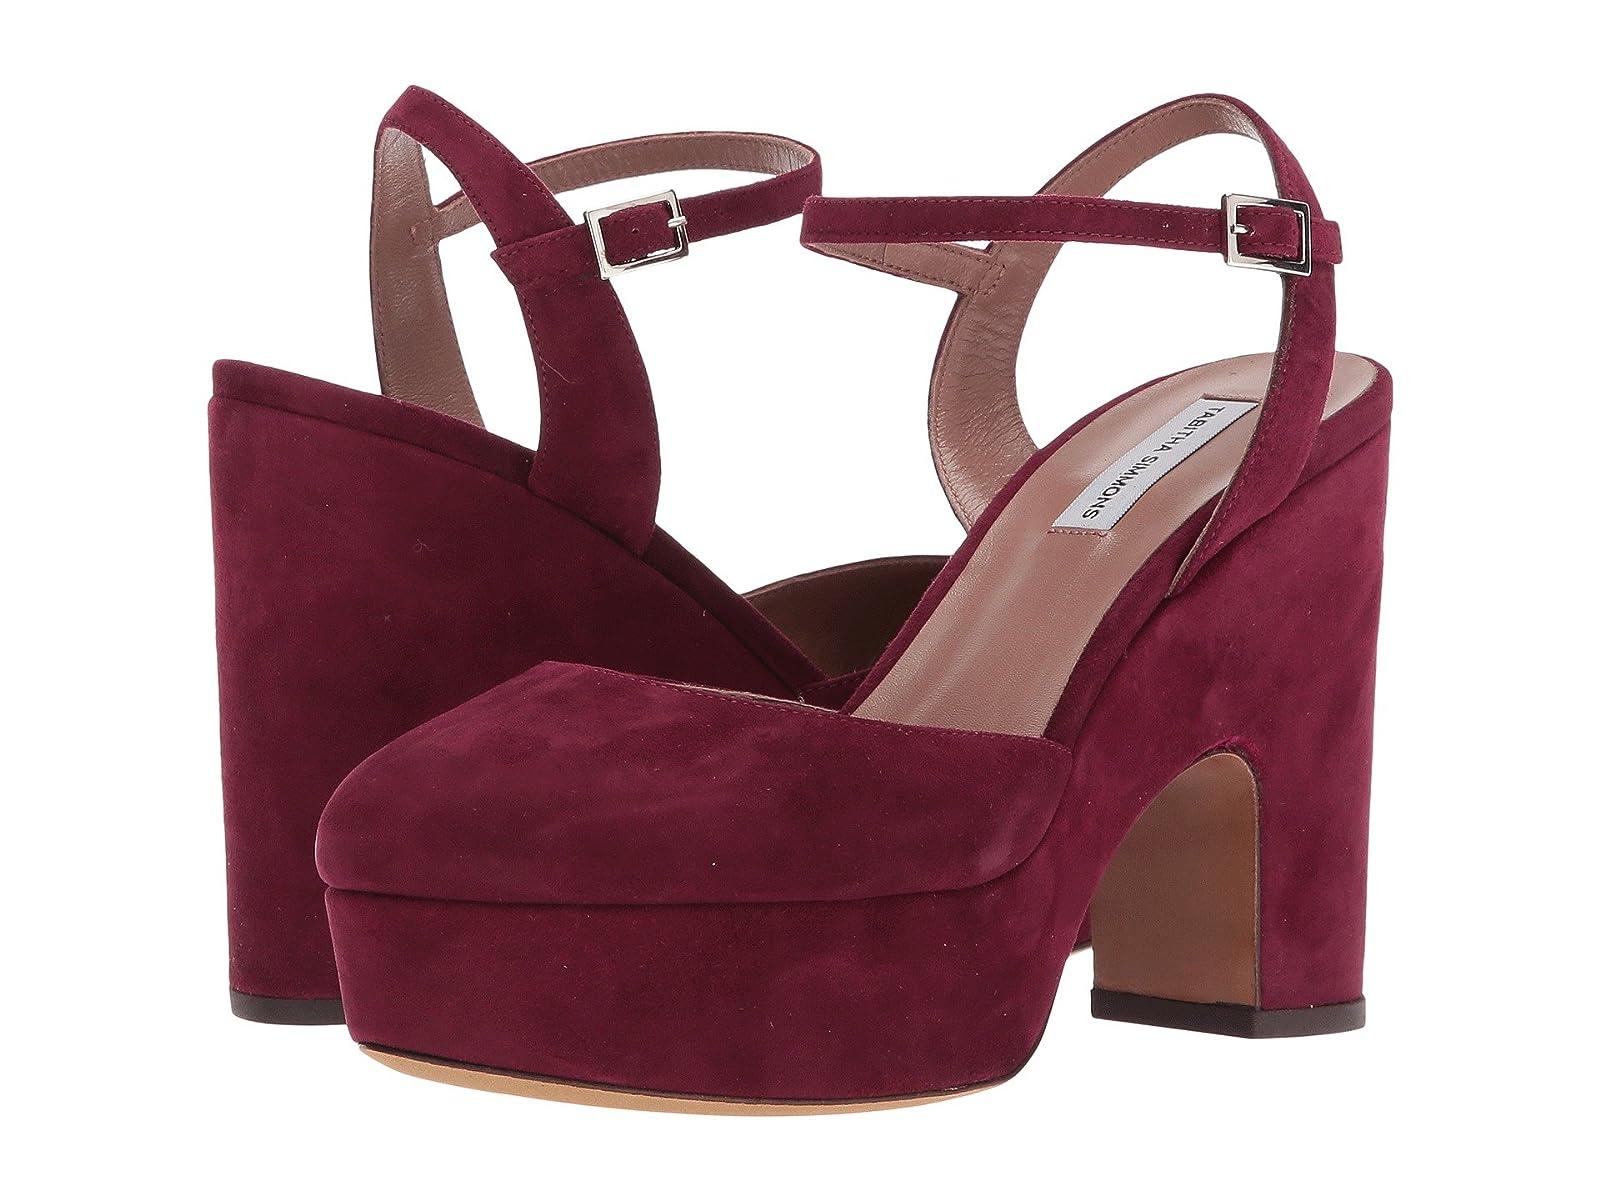 Tabitha Simmons MayaCheap and distinctive eye-catching shoes